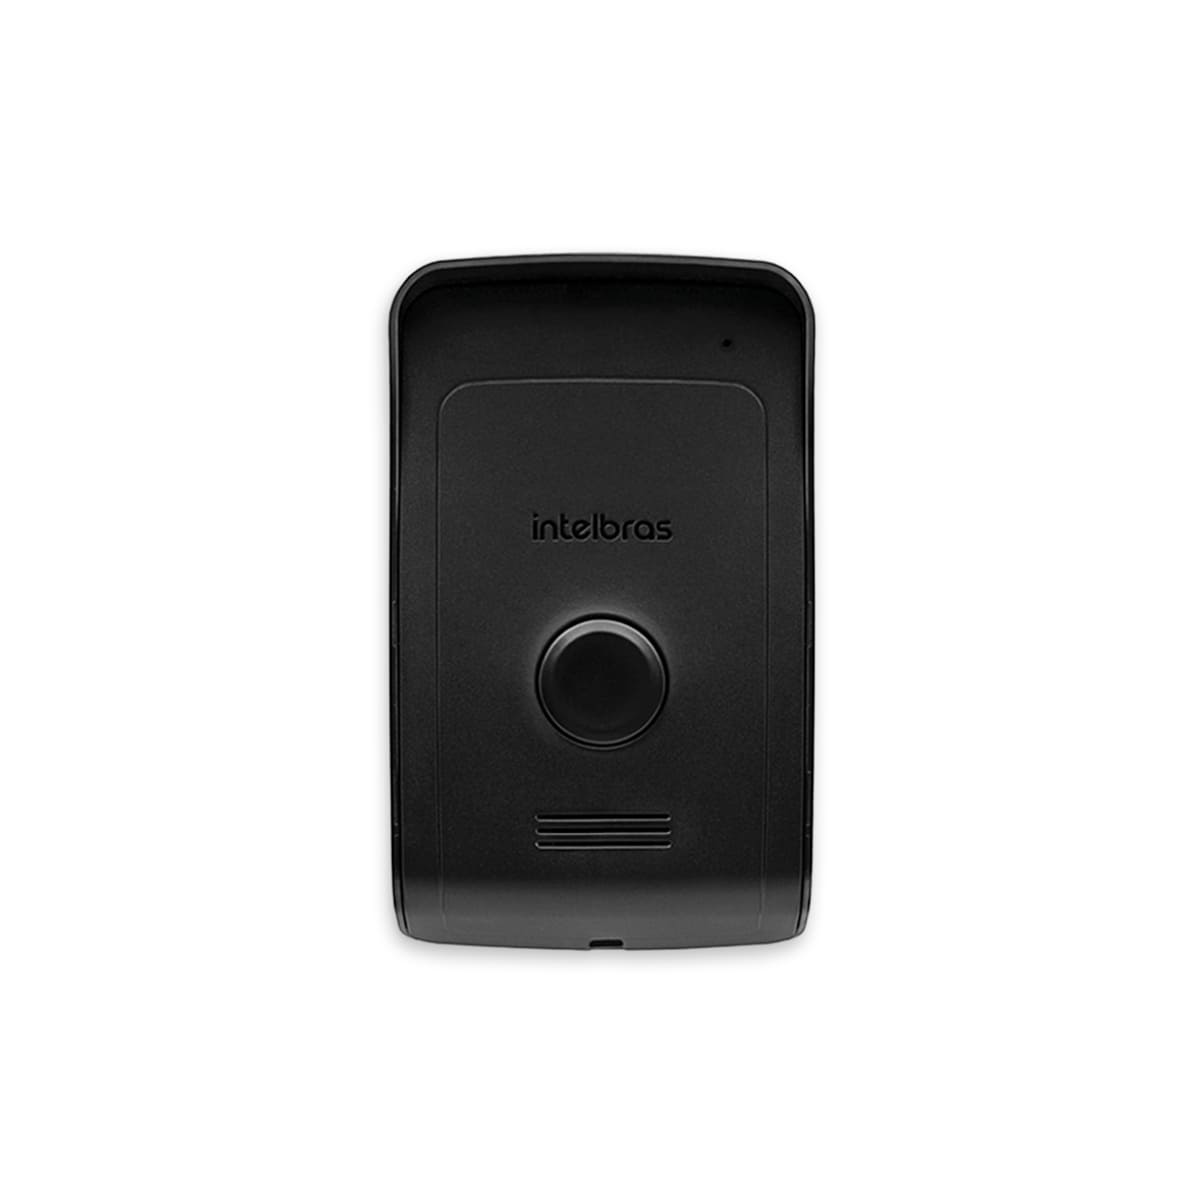 Kit Interfone Intelbras Ipr 1010 + Fechadura Intelbras Fx 500